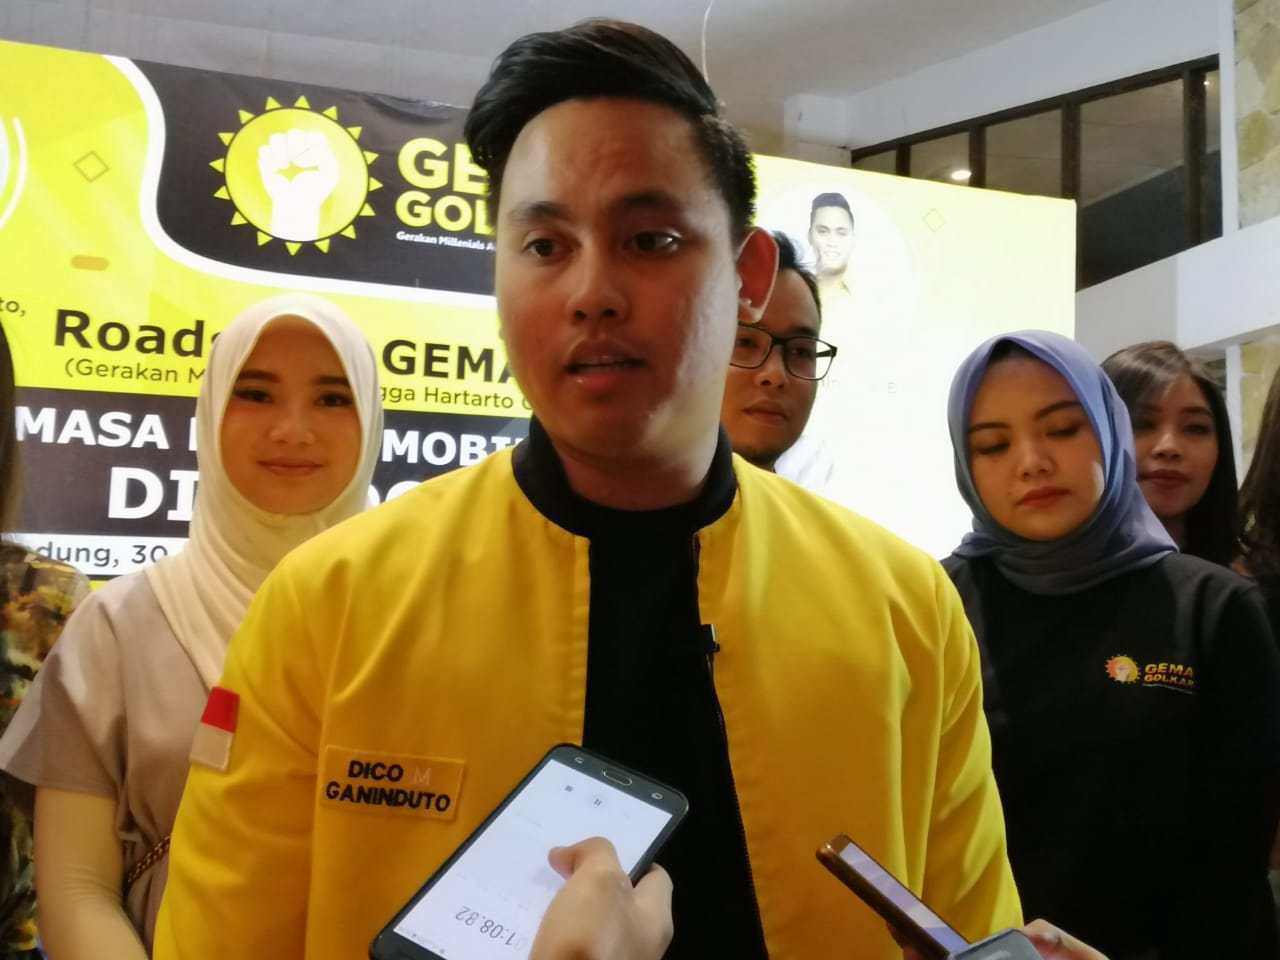 Tinggalkan Petahana Mirna Annisa, Dico Ganinduto Diusung Golkar-Demokrat Jadi Cabup Kendal 2020